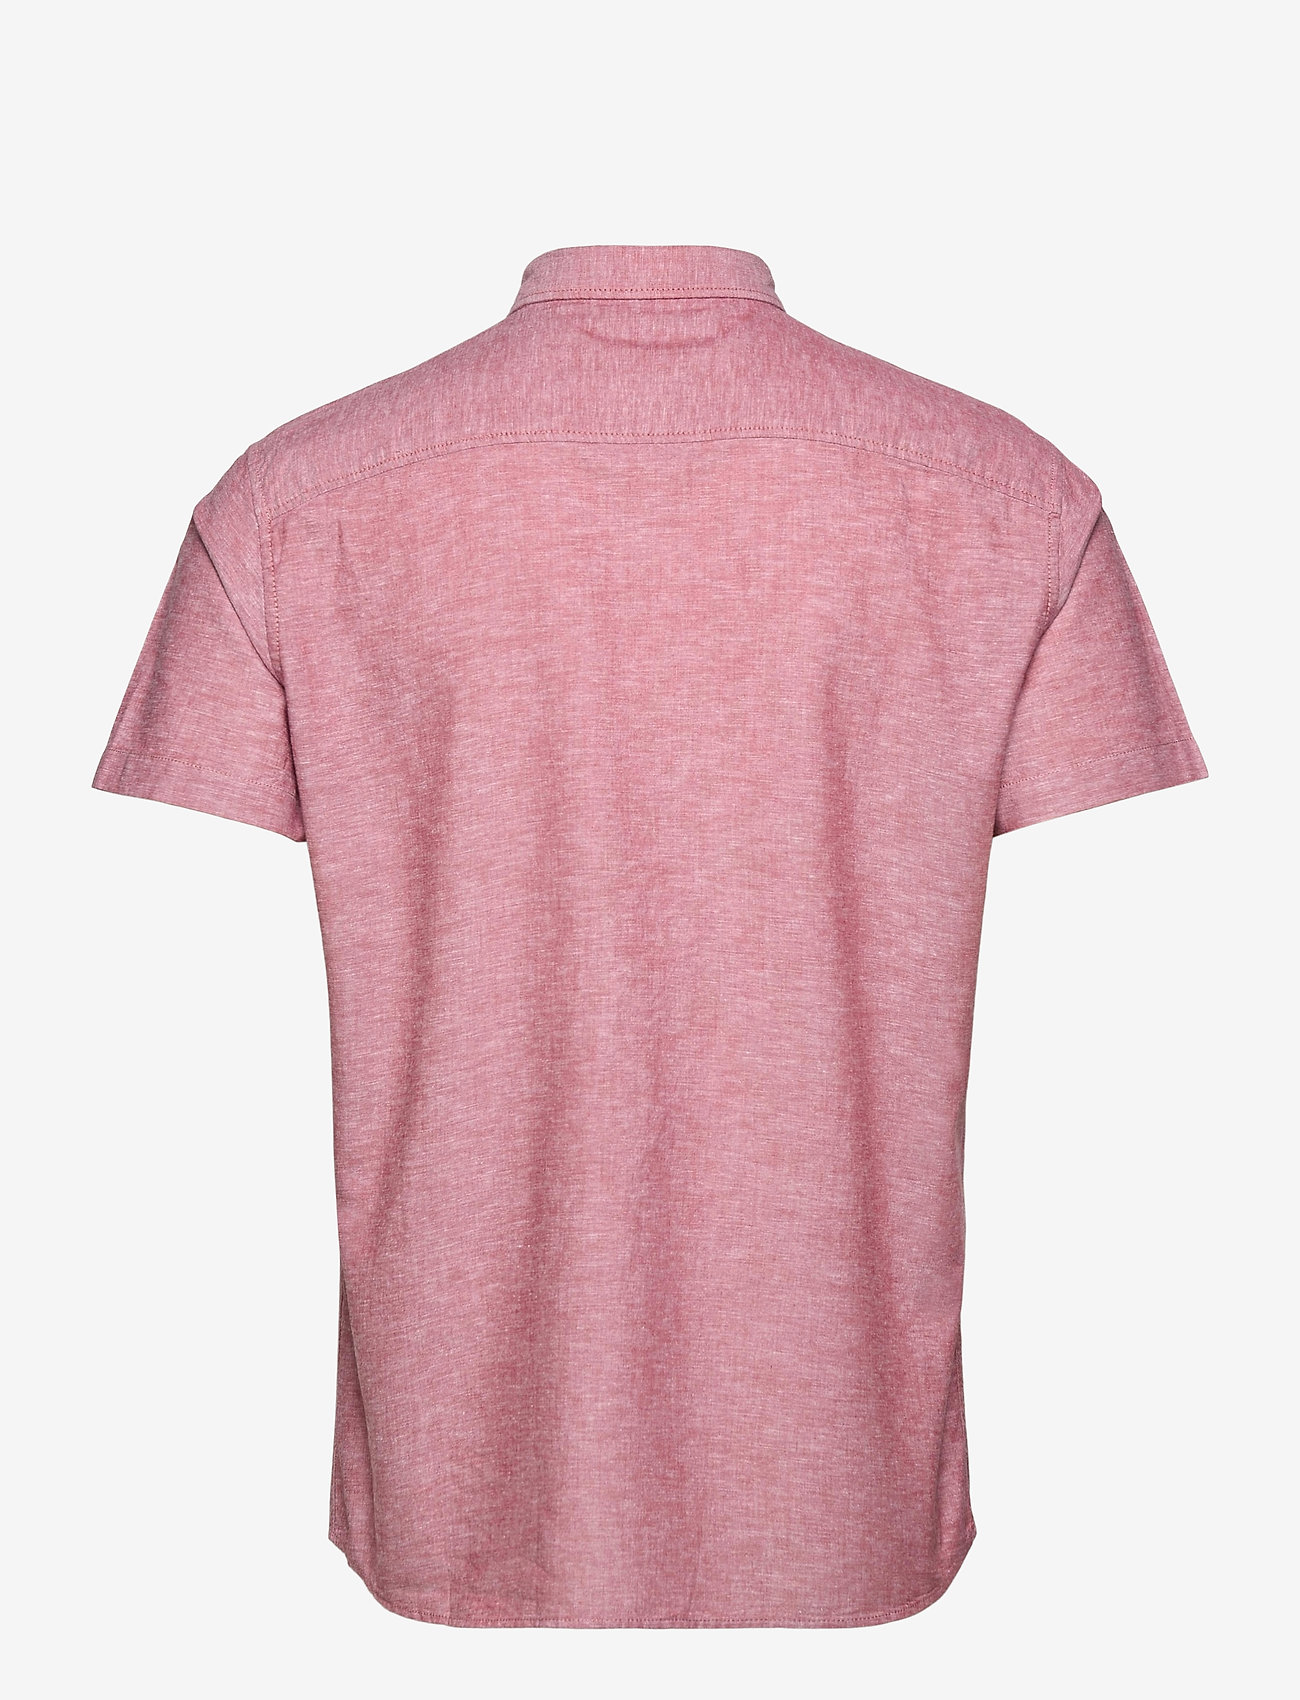 Jack & Jones - JJESUMMER SHIRT S/S S21 STS - basic skjortor - rio red - 1